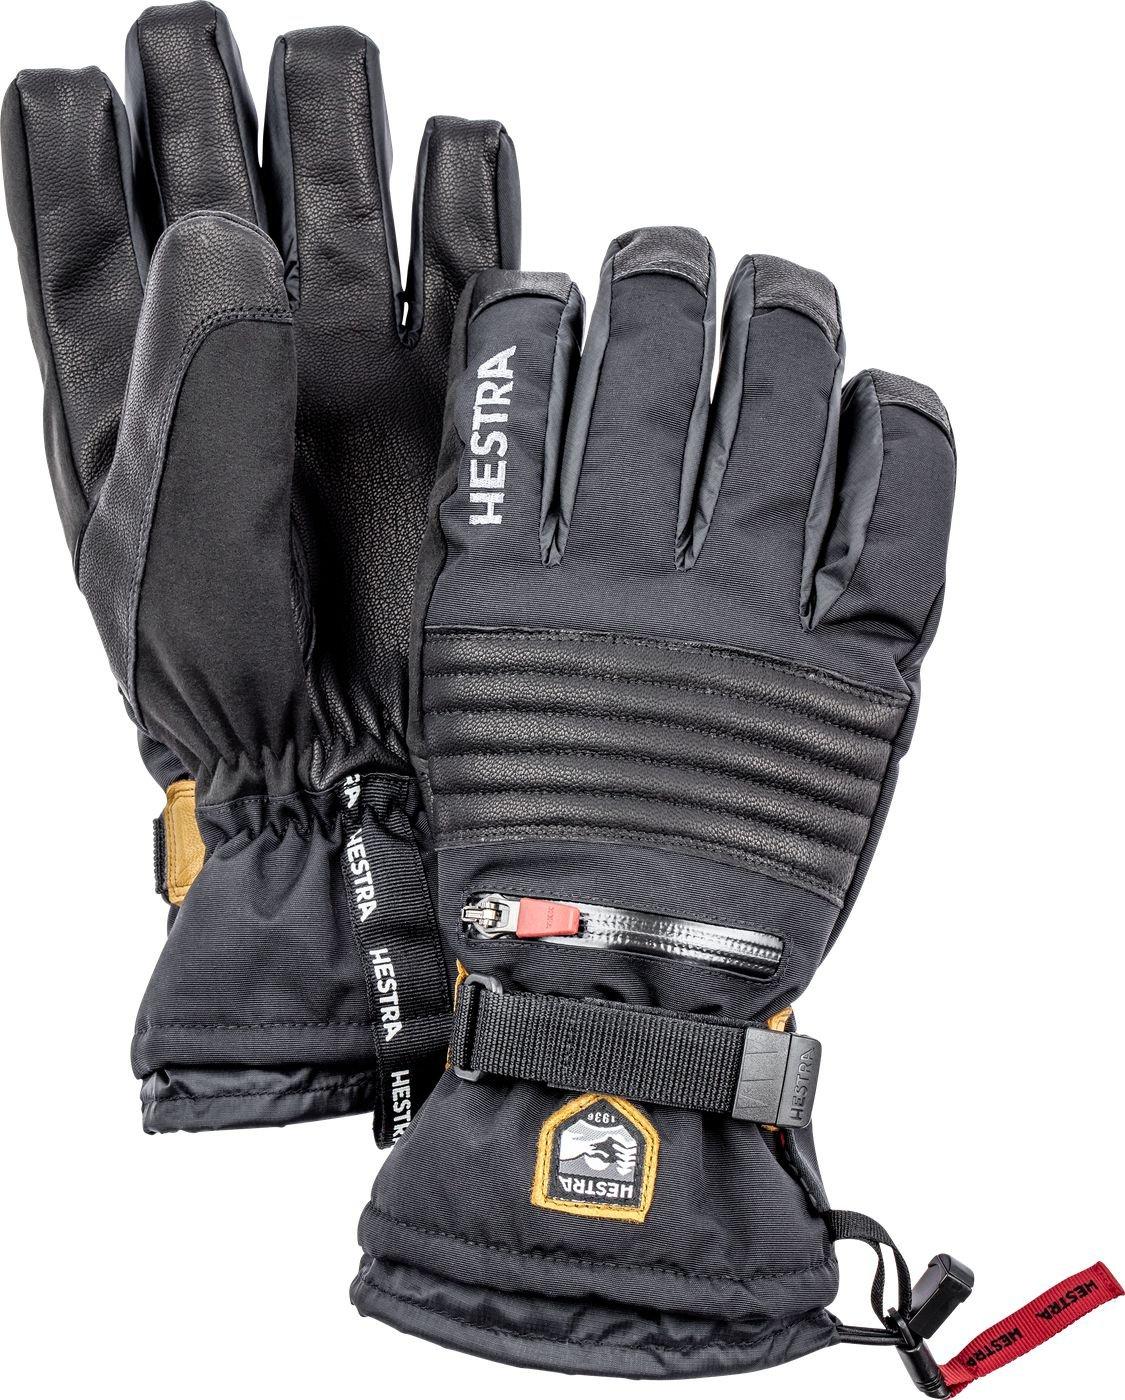 Hestra All Mountain Czone 5 Finger Glove - Black